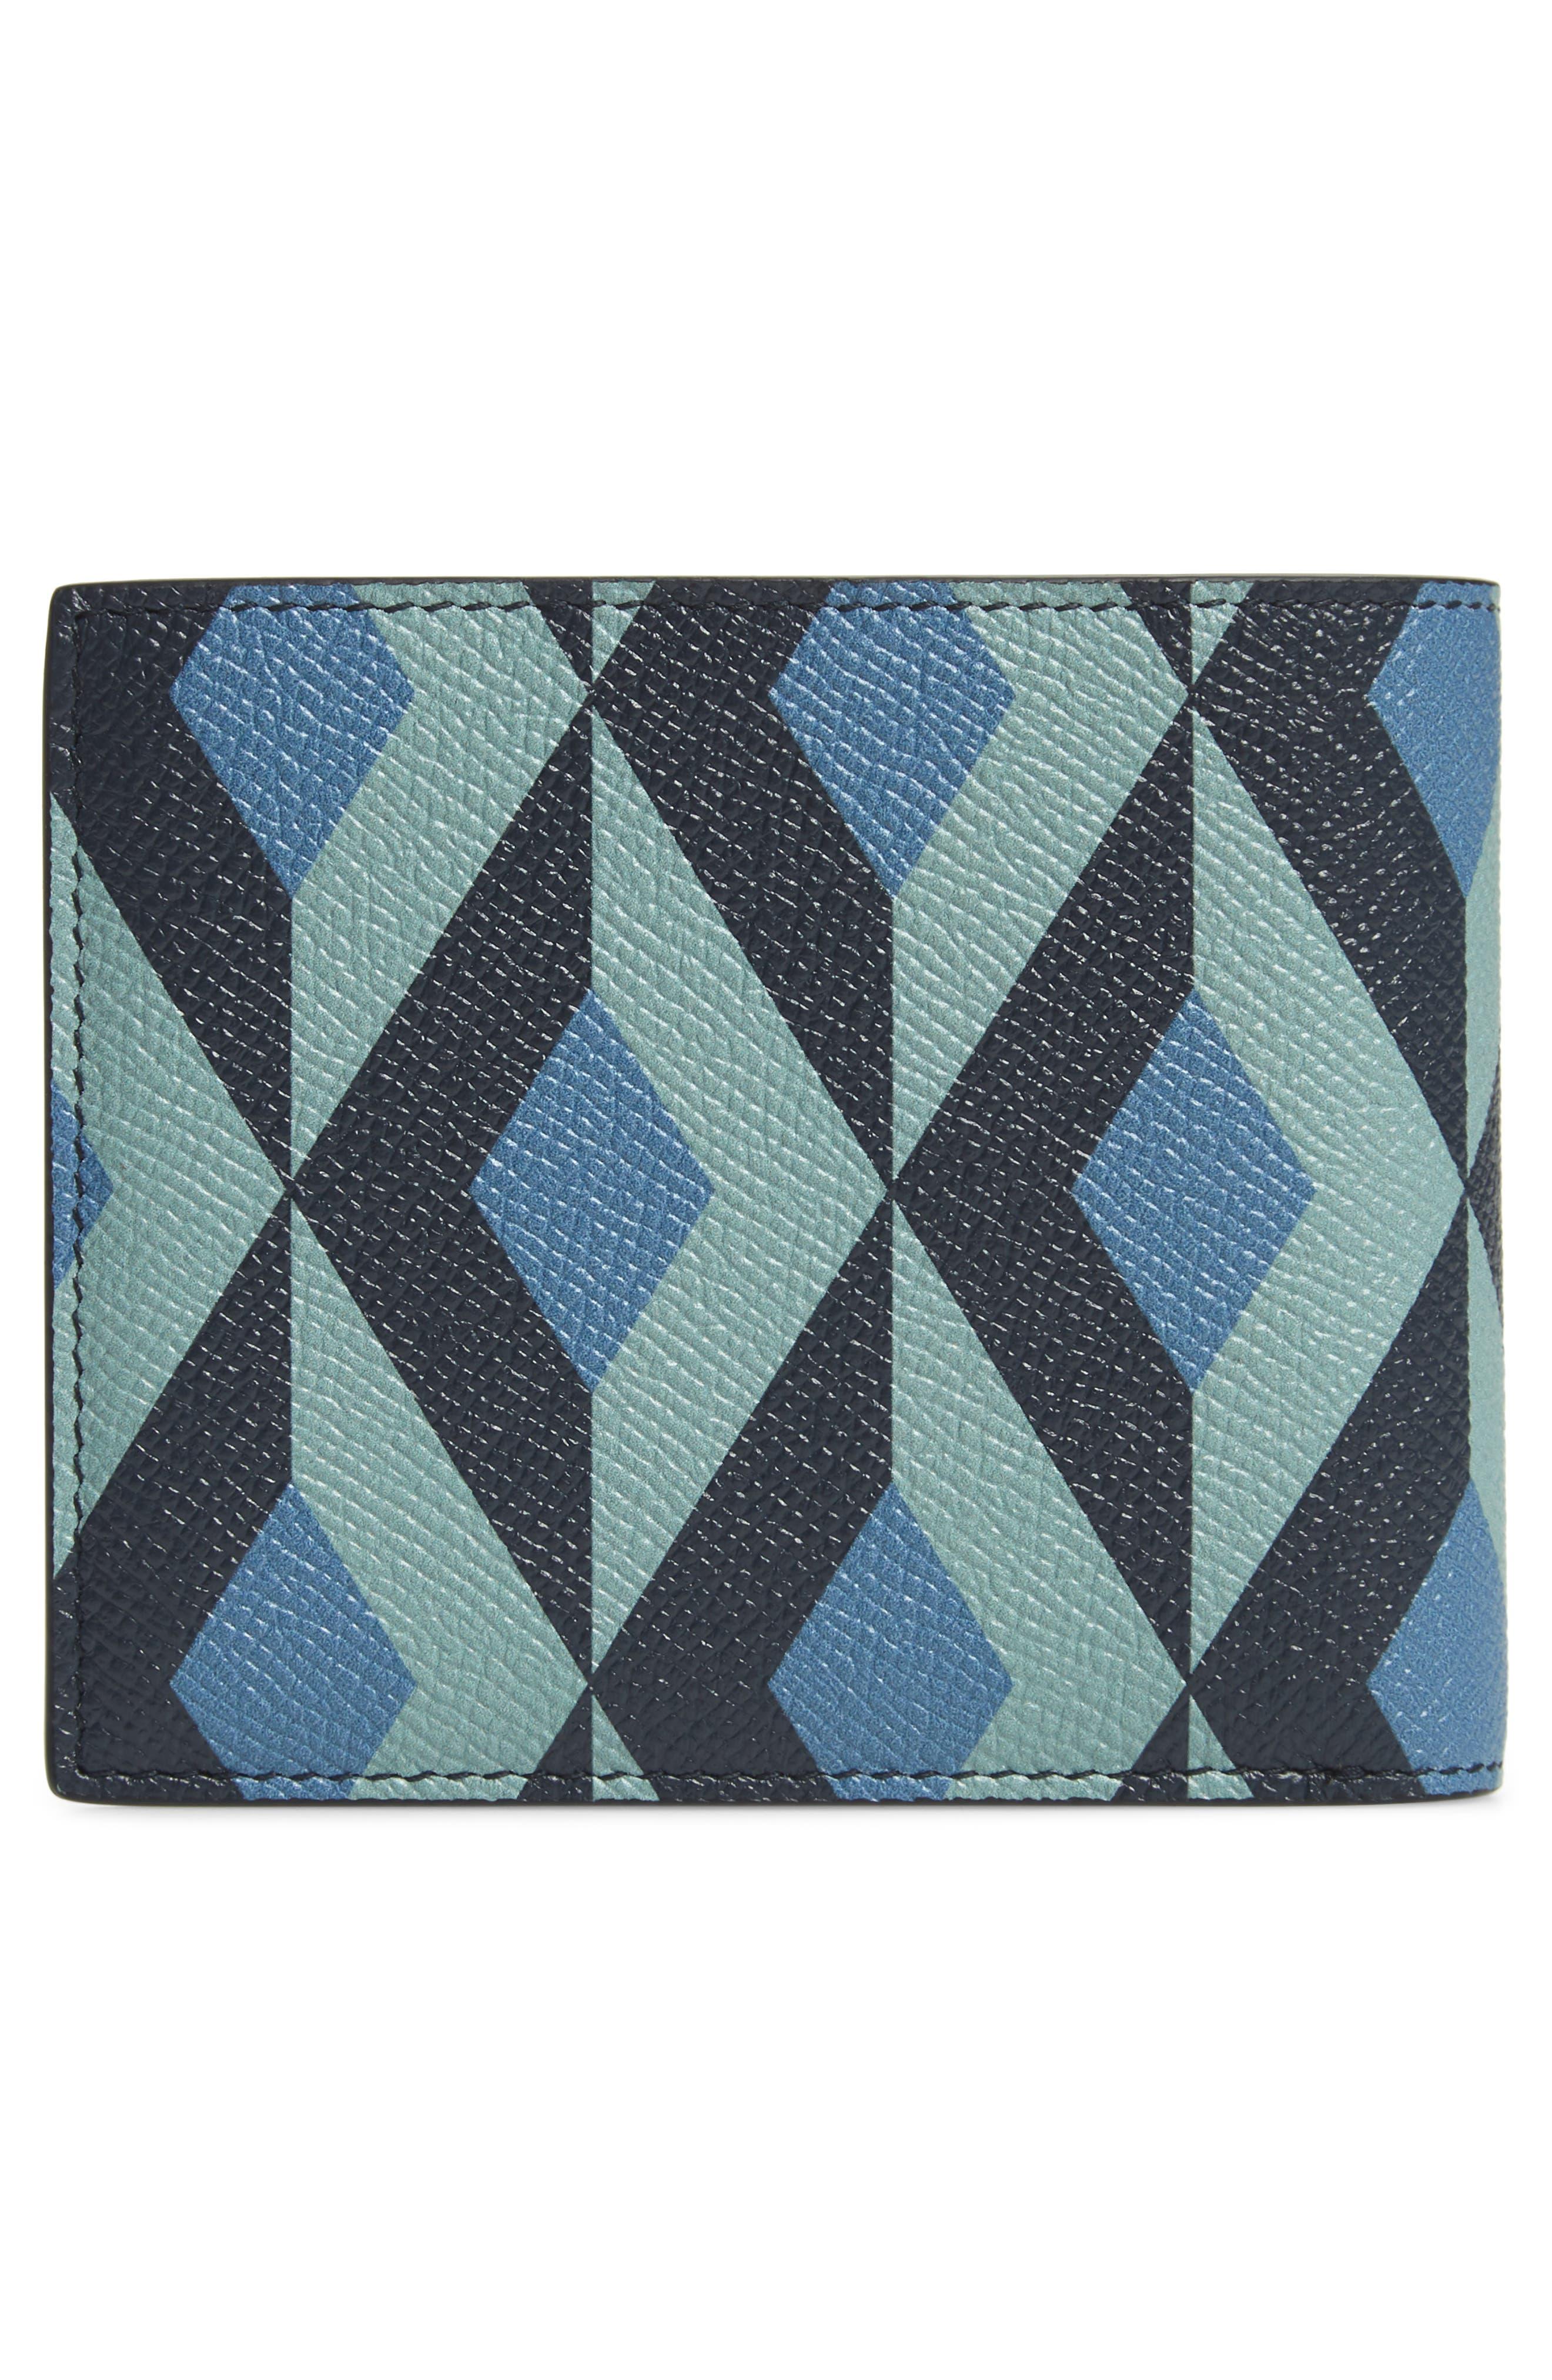 DUNHILL, Cadogan Leather Wallet, Alternate thumbnail 3, color, STONE BLUE